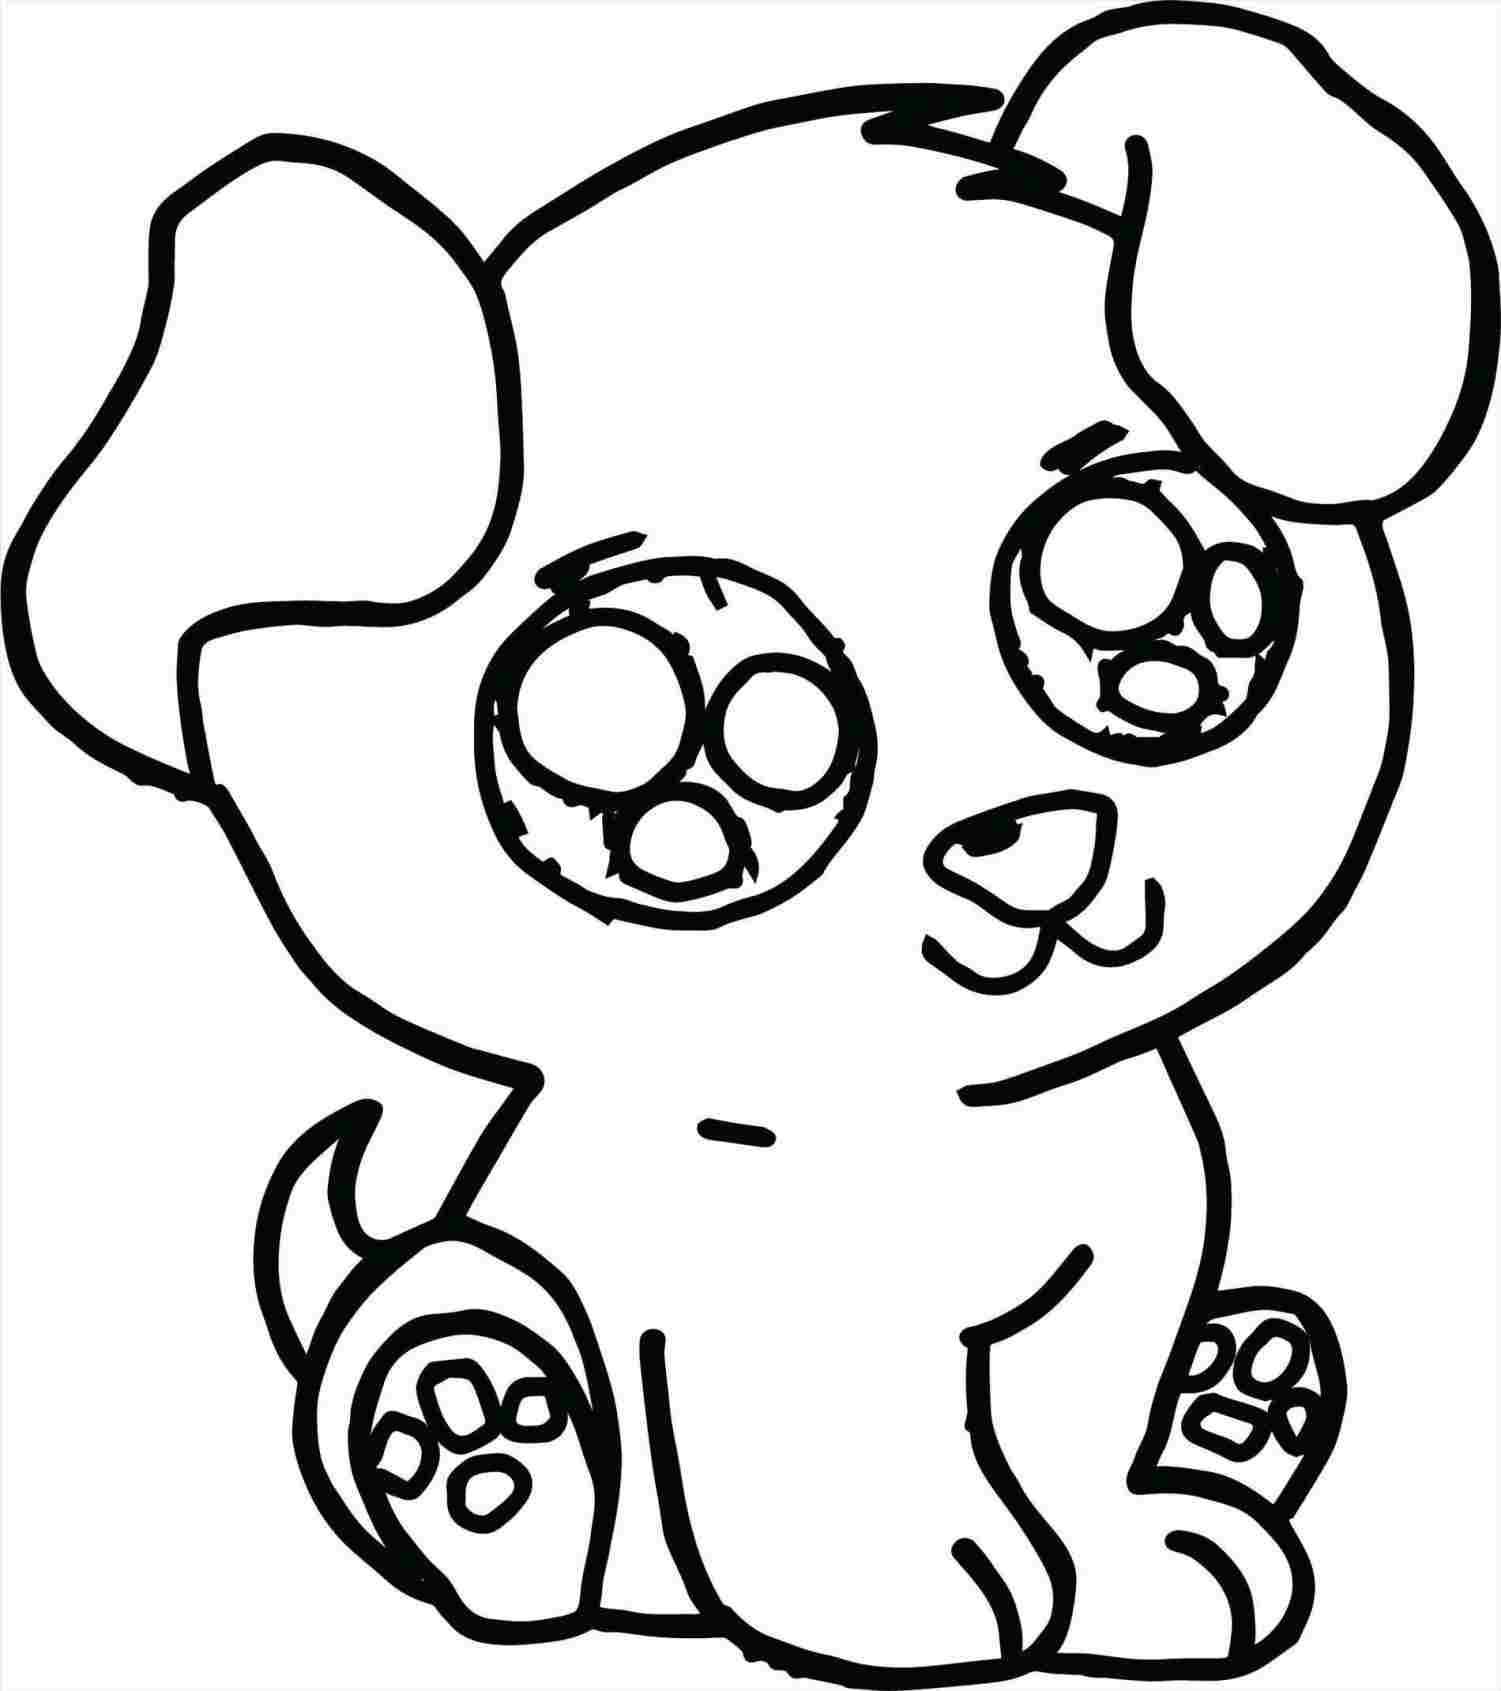 1501x1691 Cute Puppy To Draw A Easy German Shepard Drawing Fajne